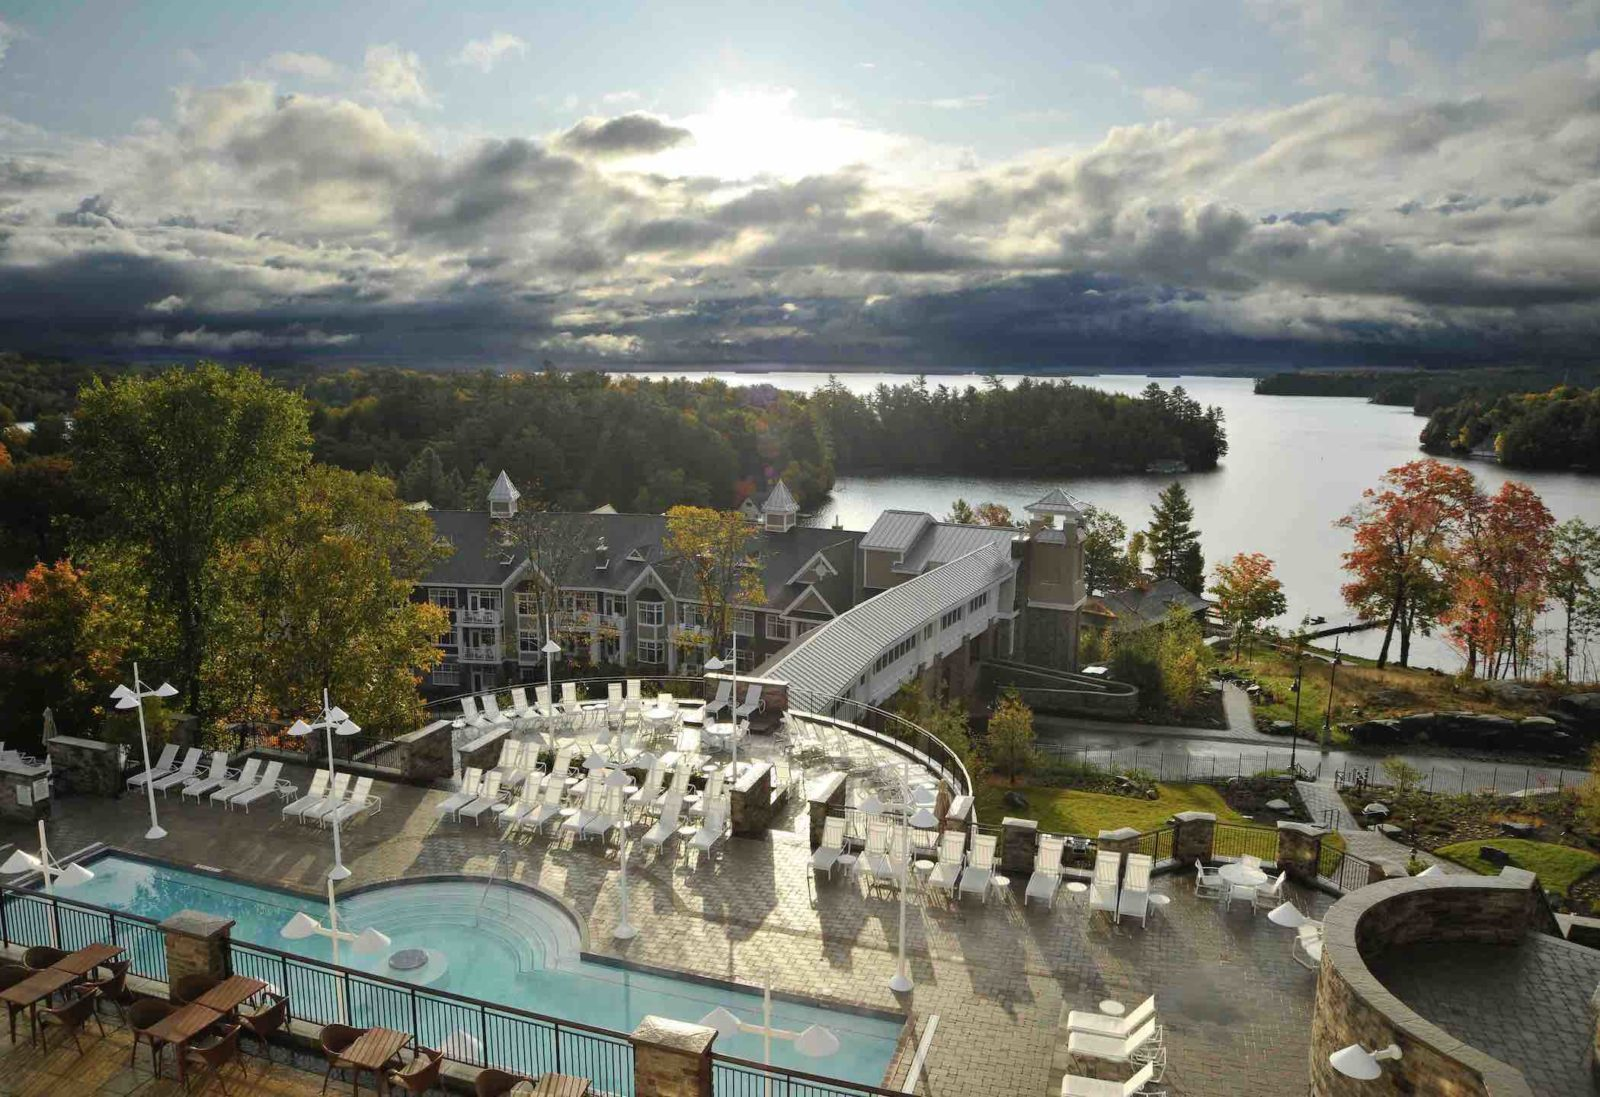 JW Mariott Resort aerial view